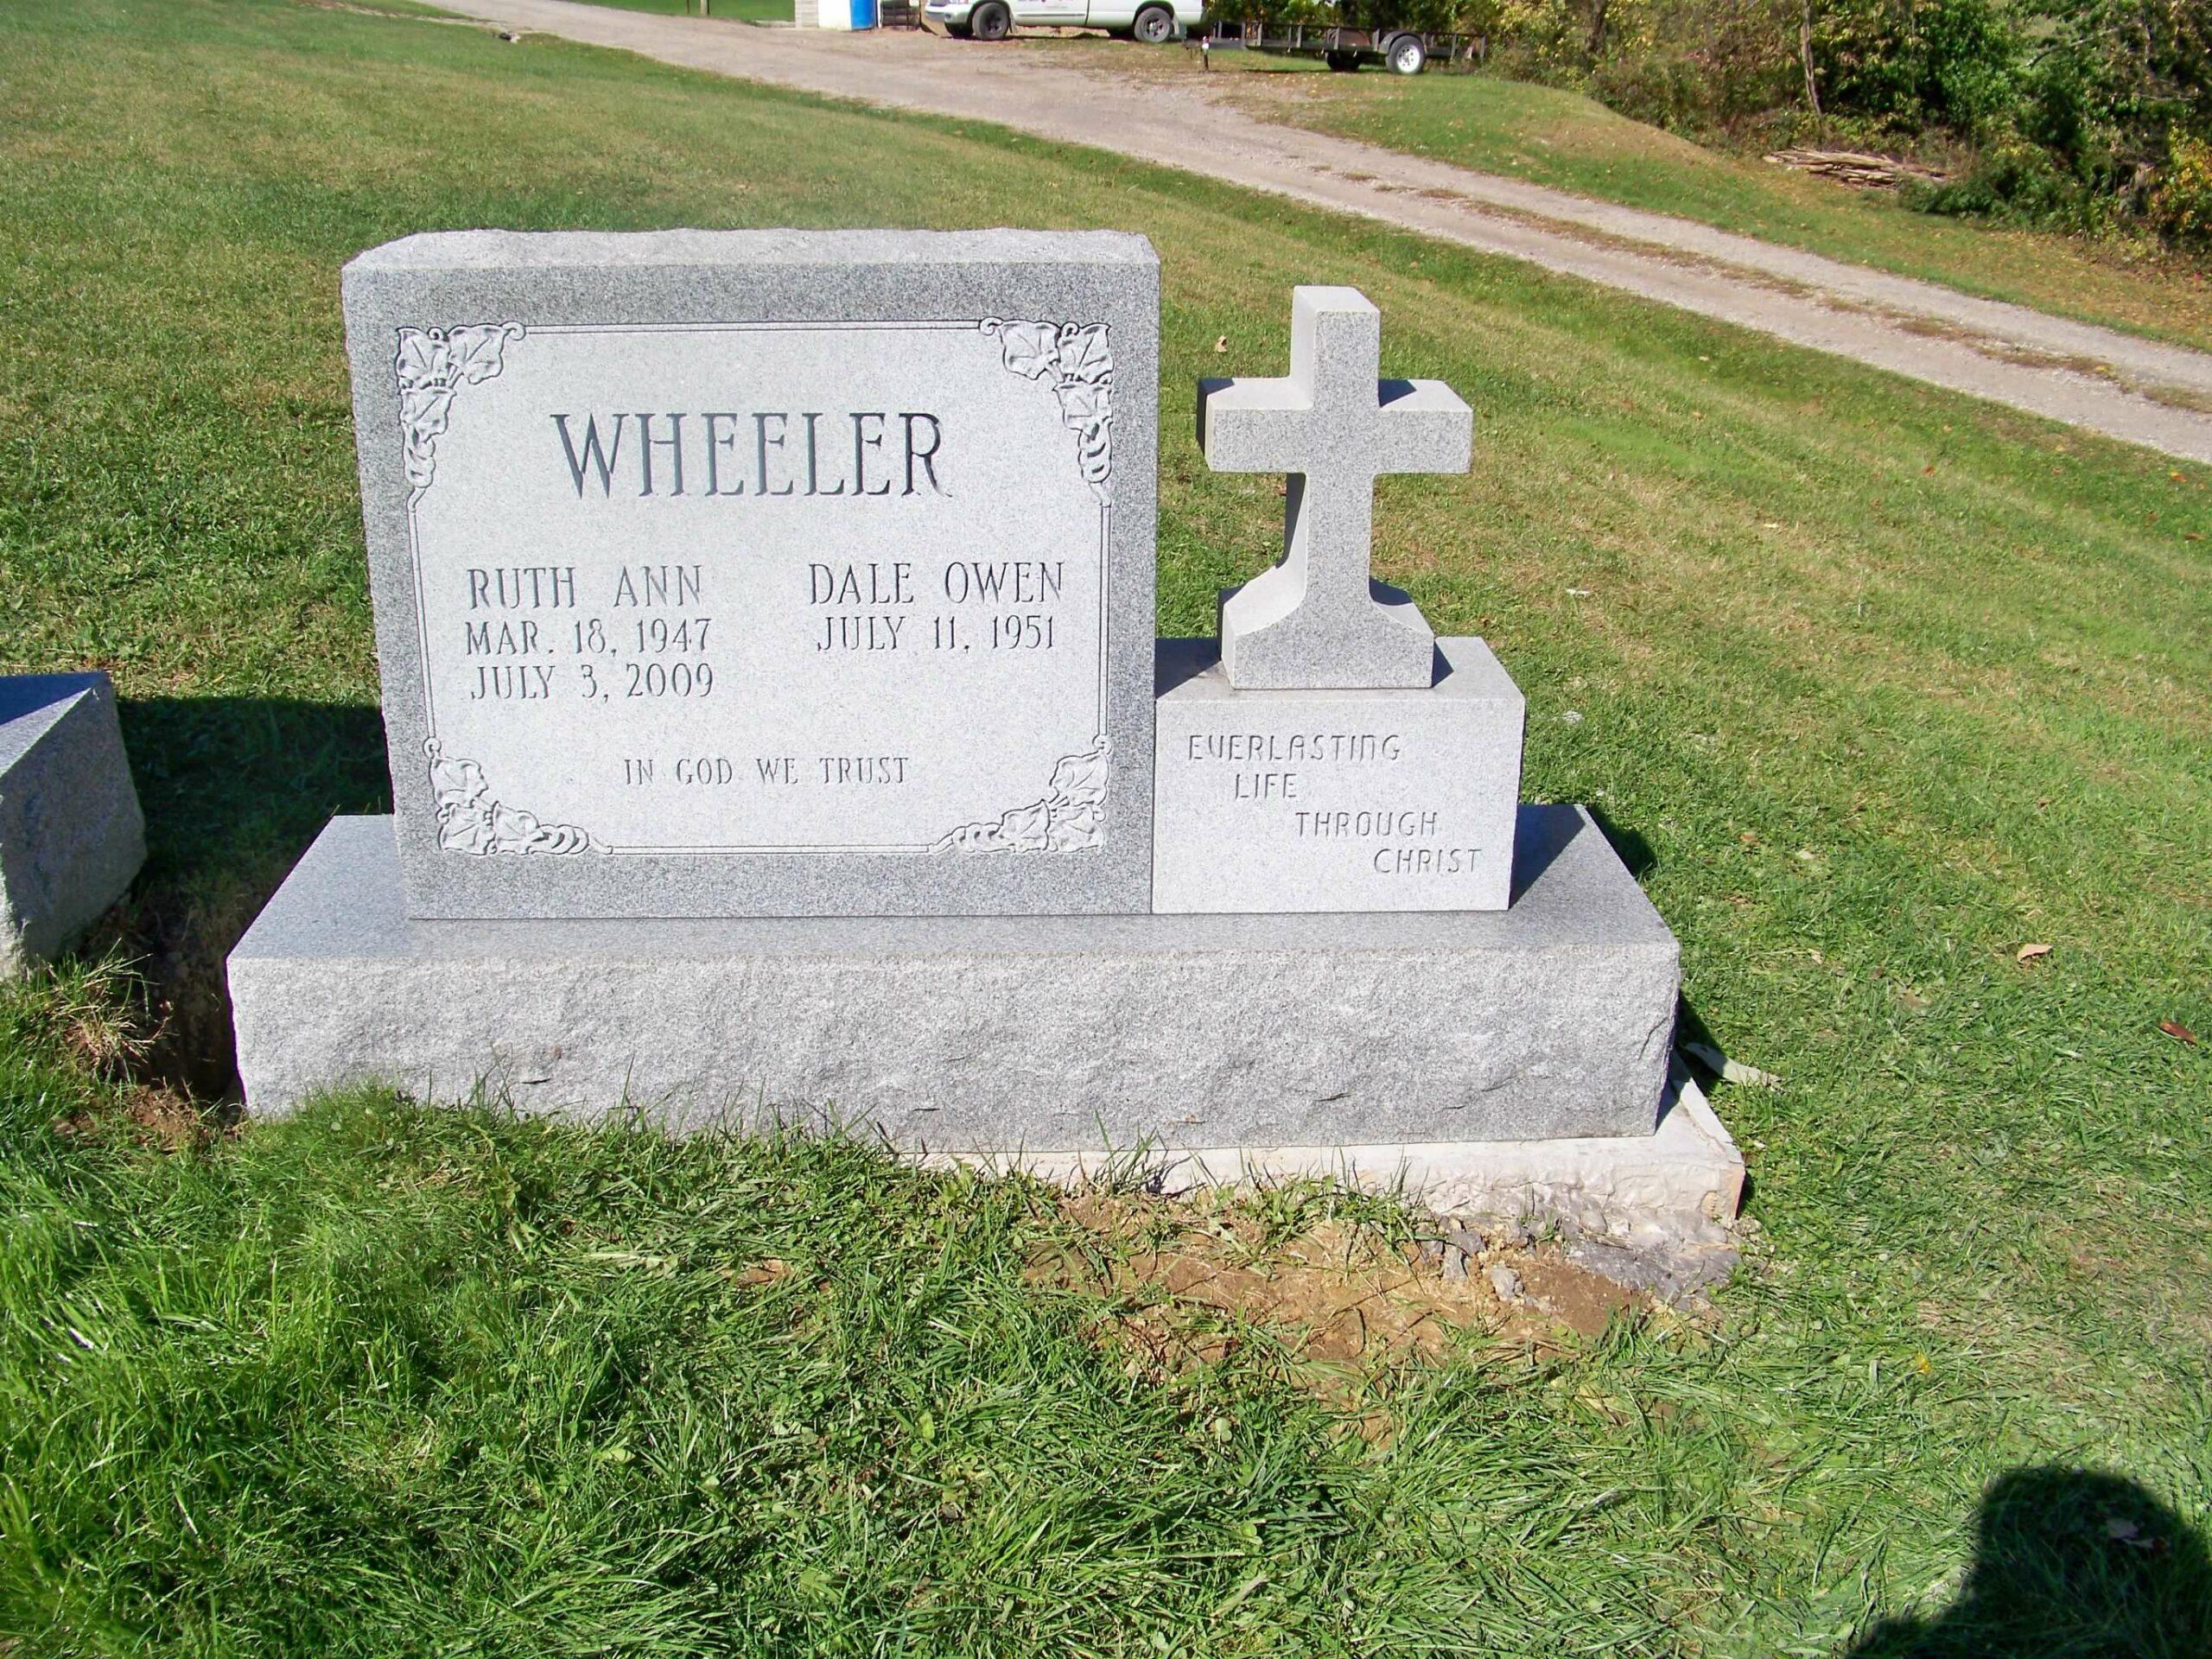 Wheeler, Ruth